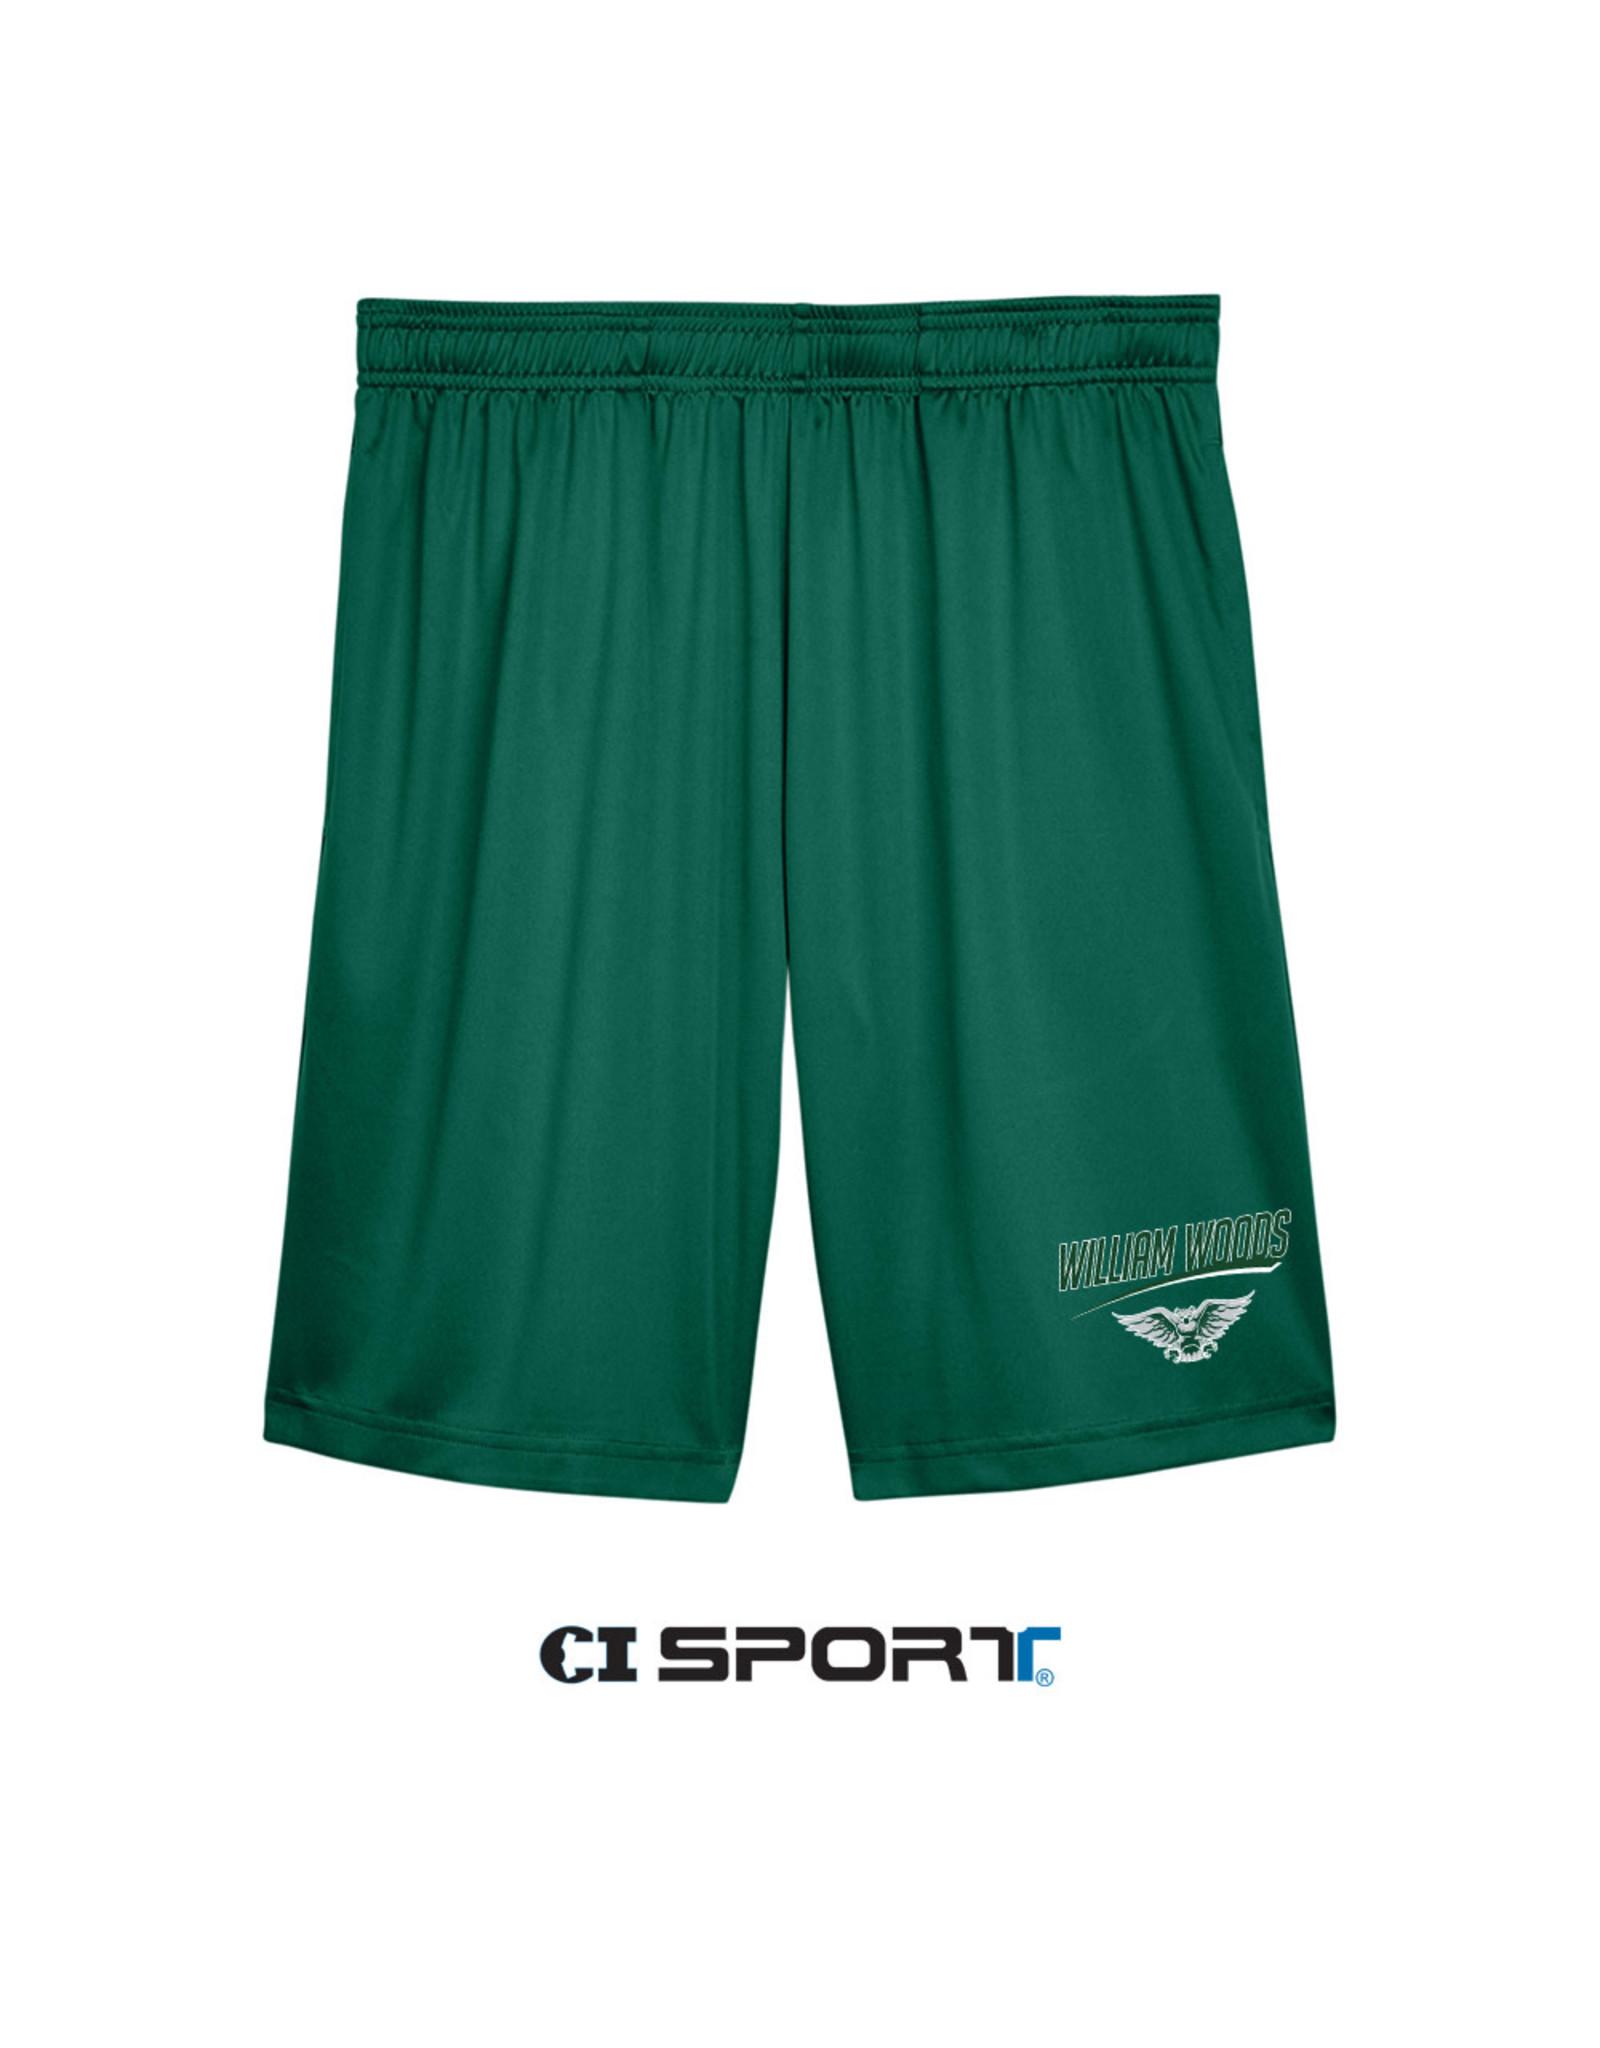 Performance Men's Shorts